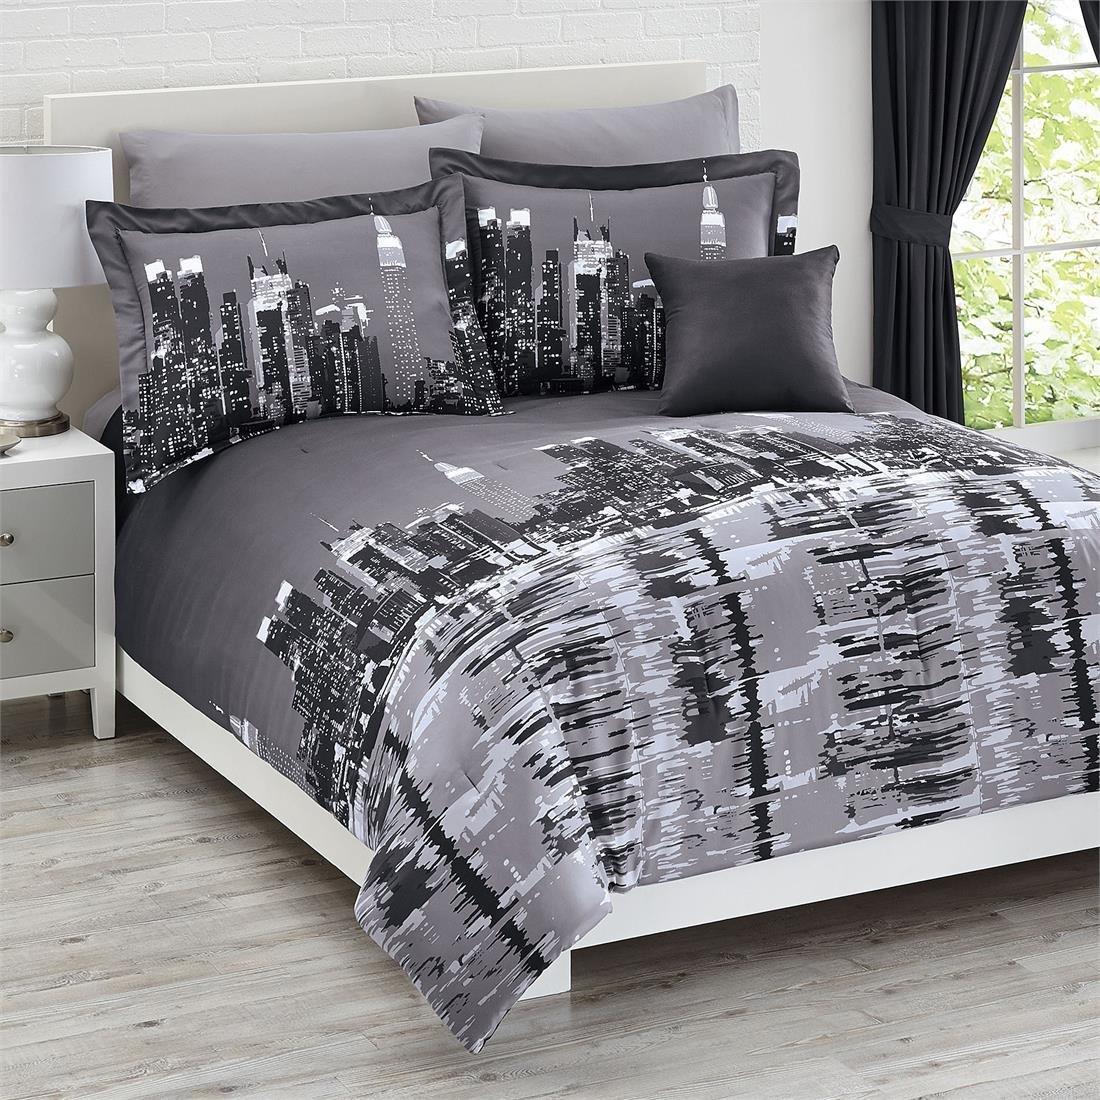 Best Graphic of New York Bedroom | Patricia Woodard